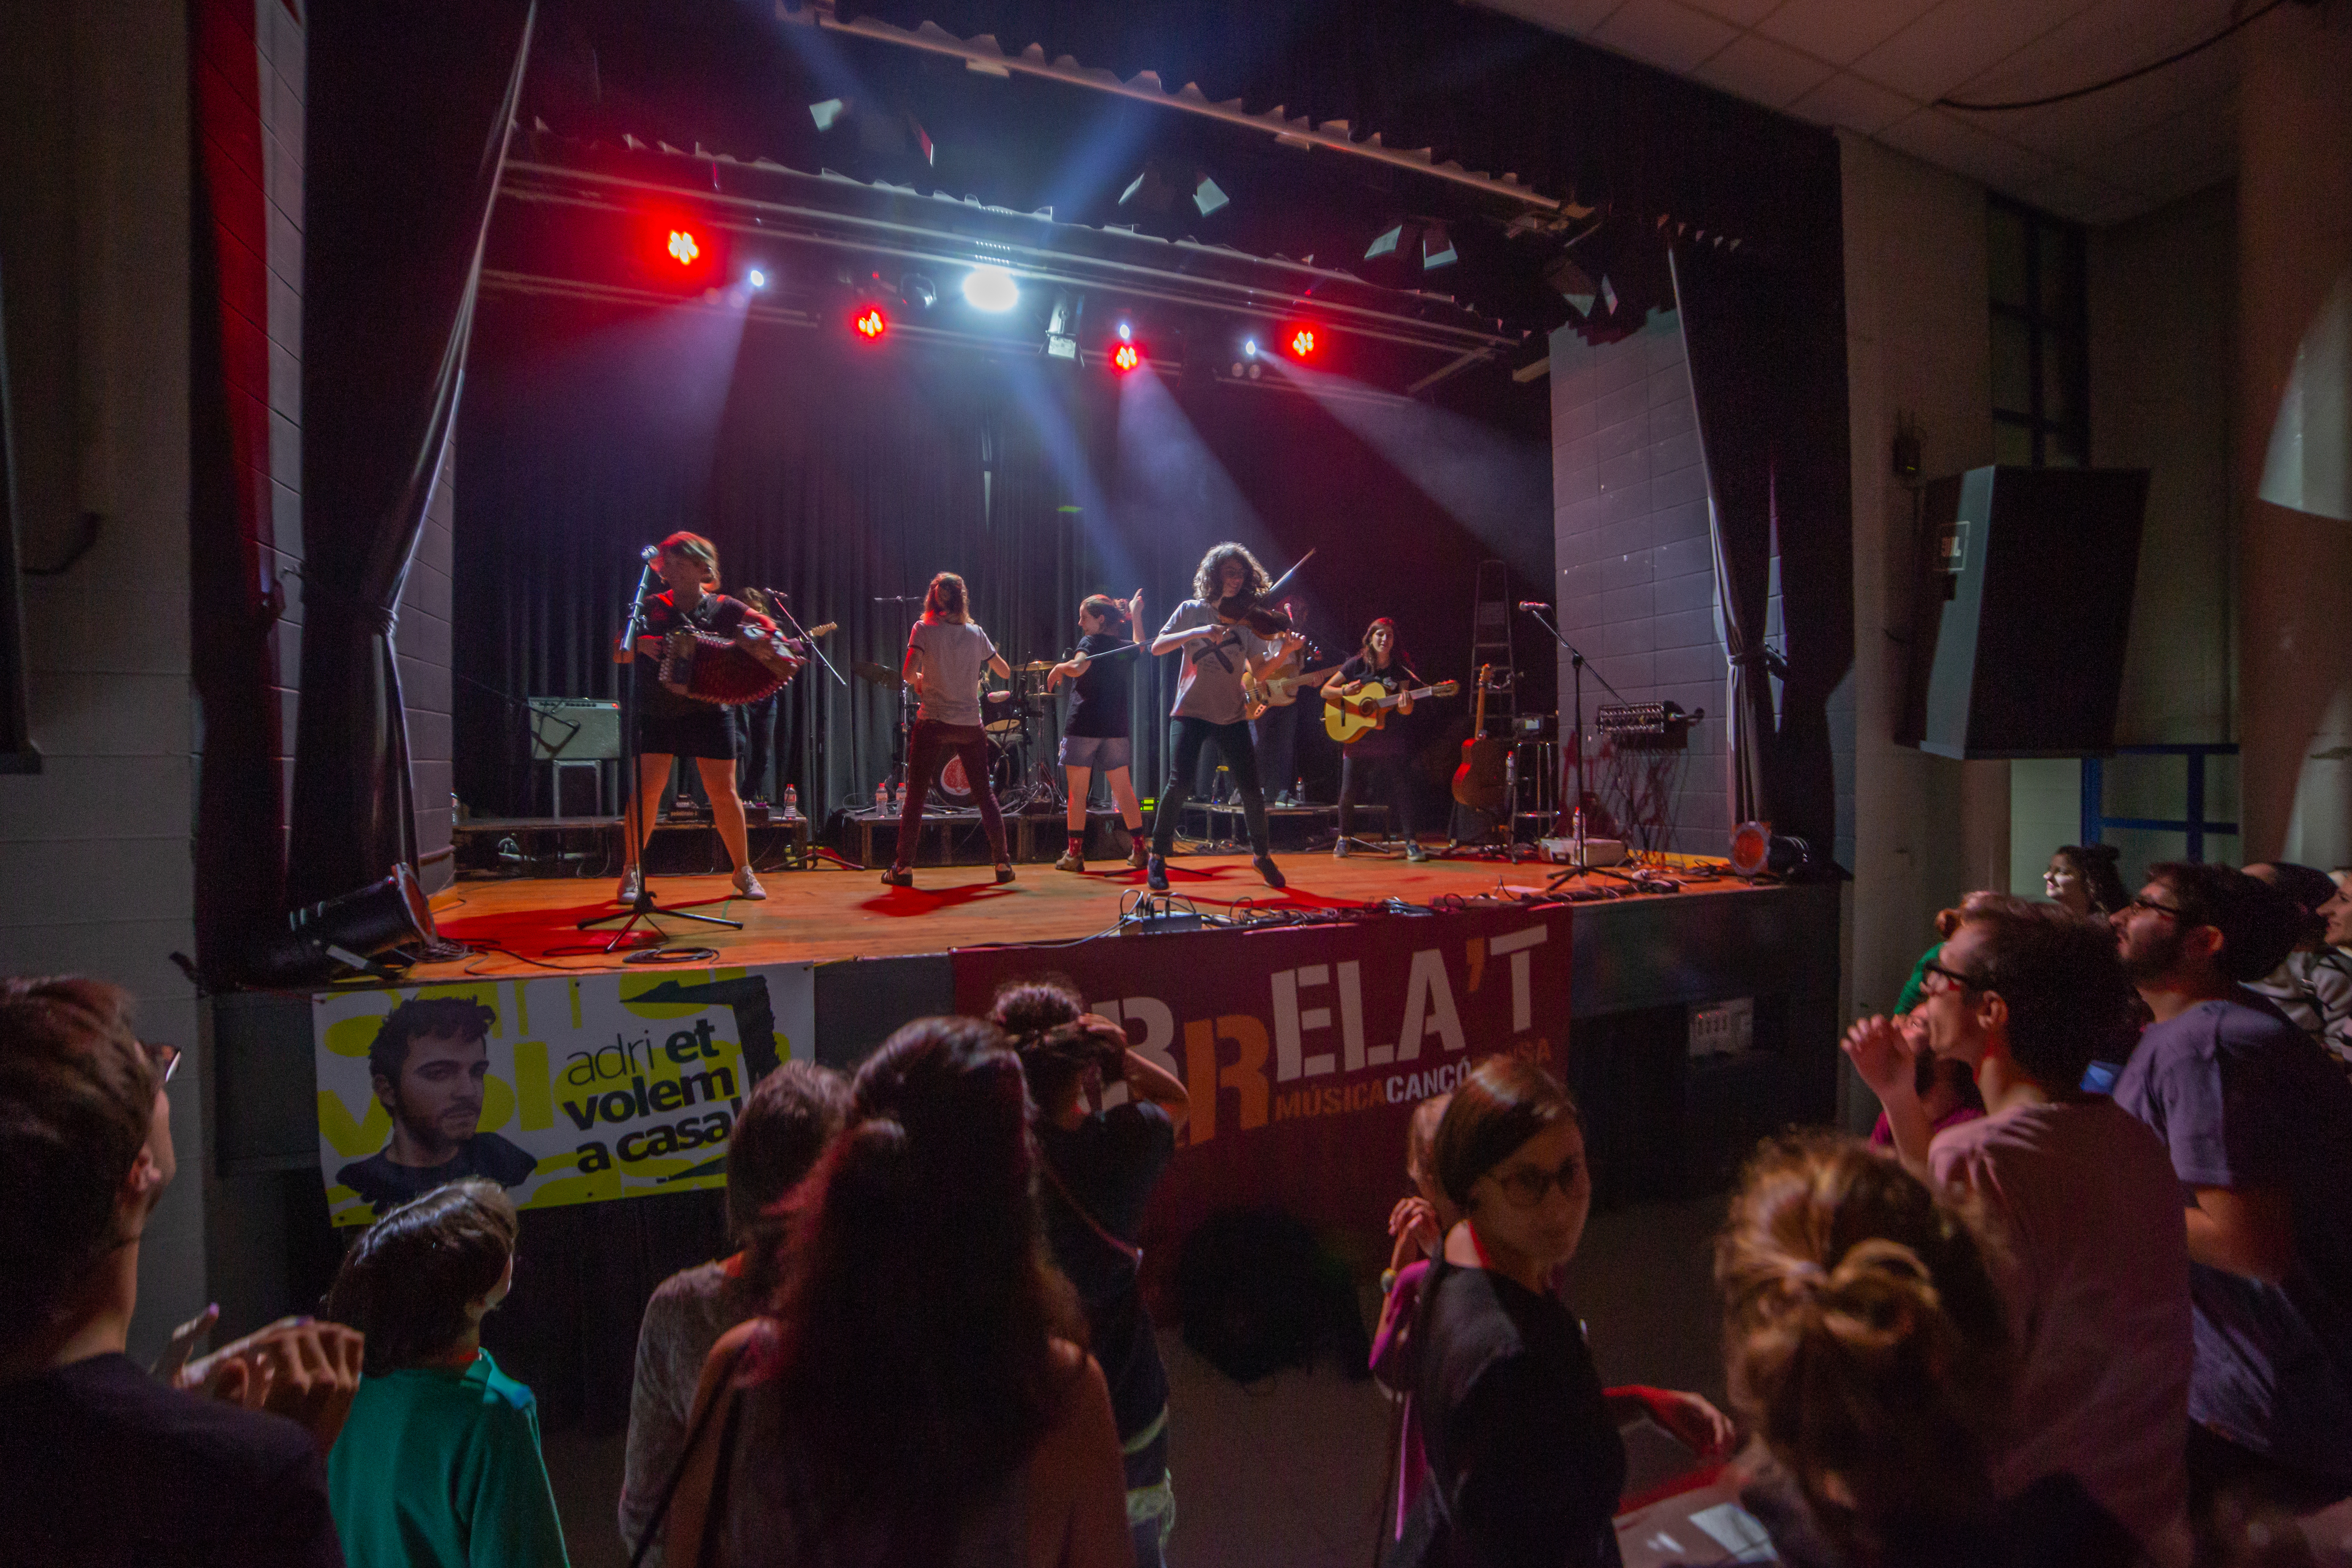 Festival Arrela't - Roba Estesa